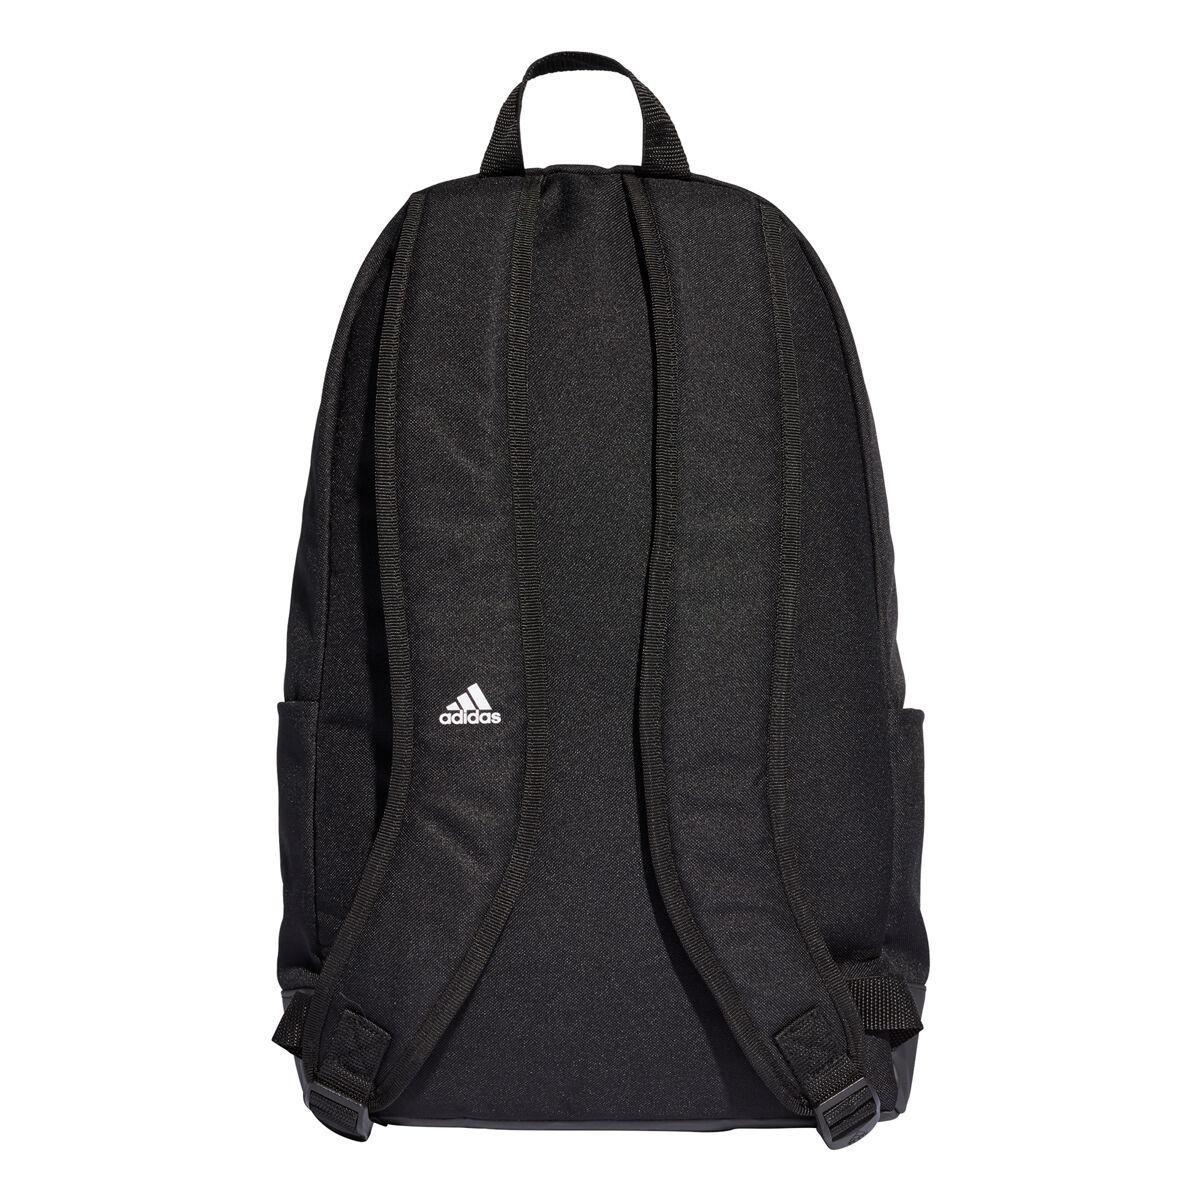 1998 00 Real Madrid Adidas Waterproof Training Jacket (Fair) ML